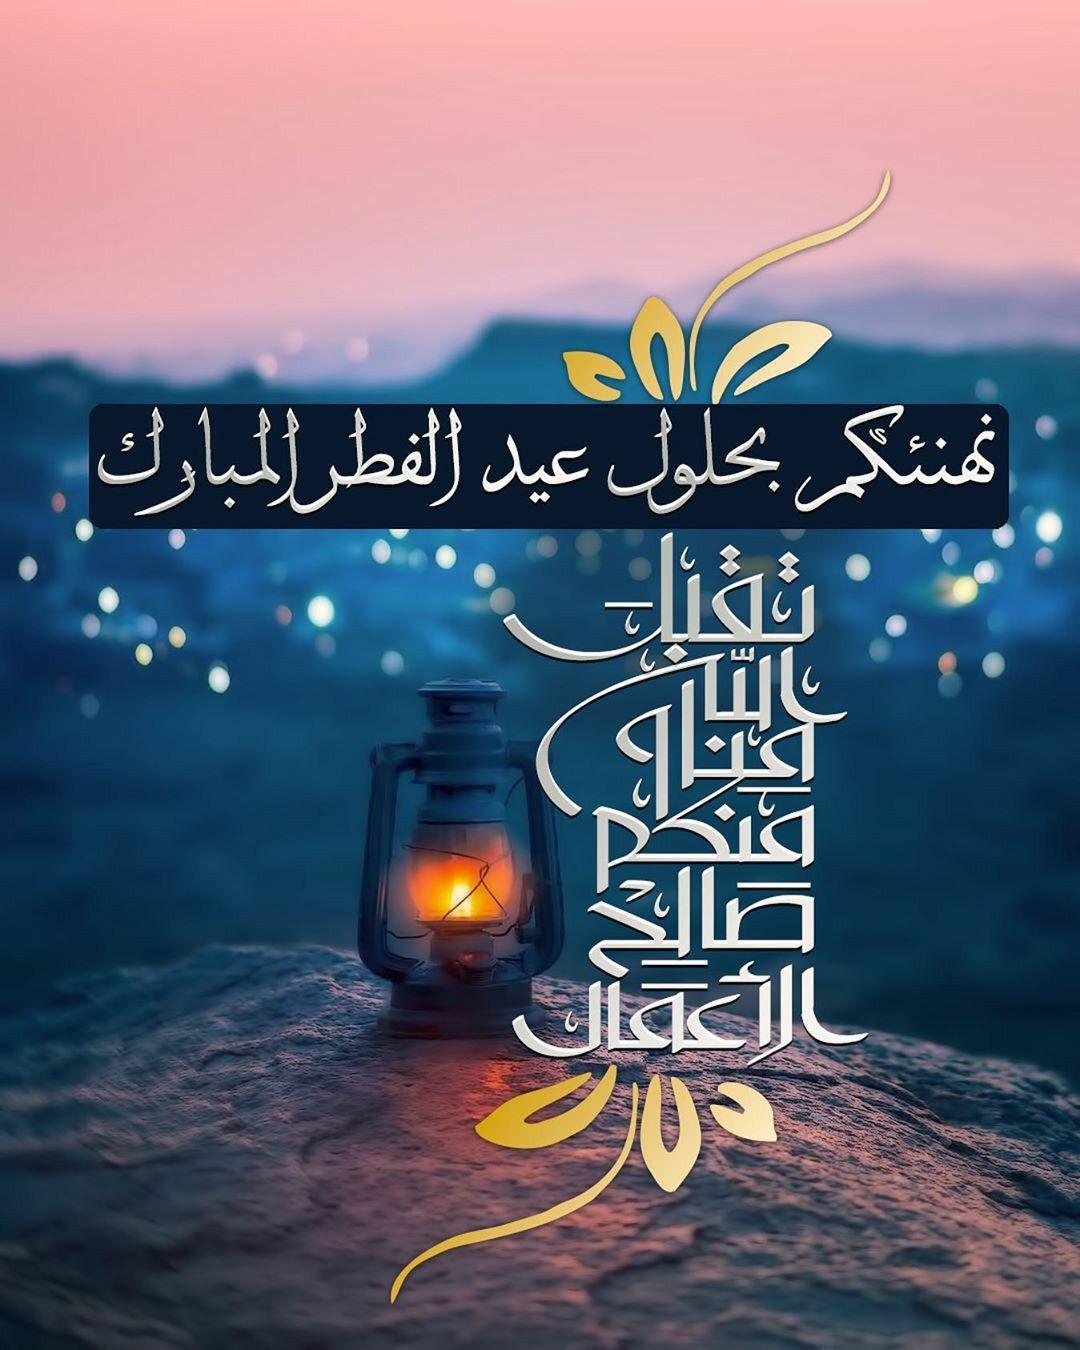 Pin By Moses Moudy On تهاني العيد الفطر المبارك لعام ١٤٤٠ Instagram Oil Painting Ramadan